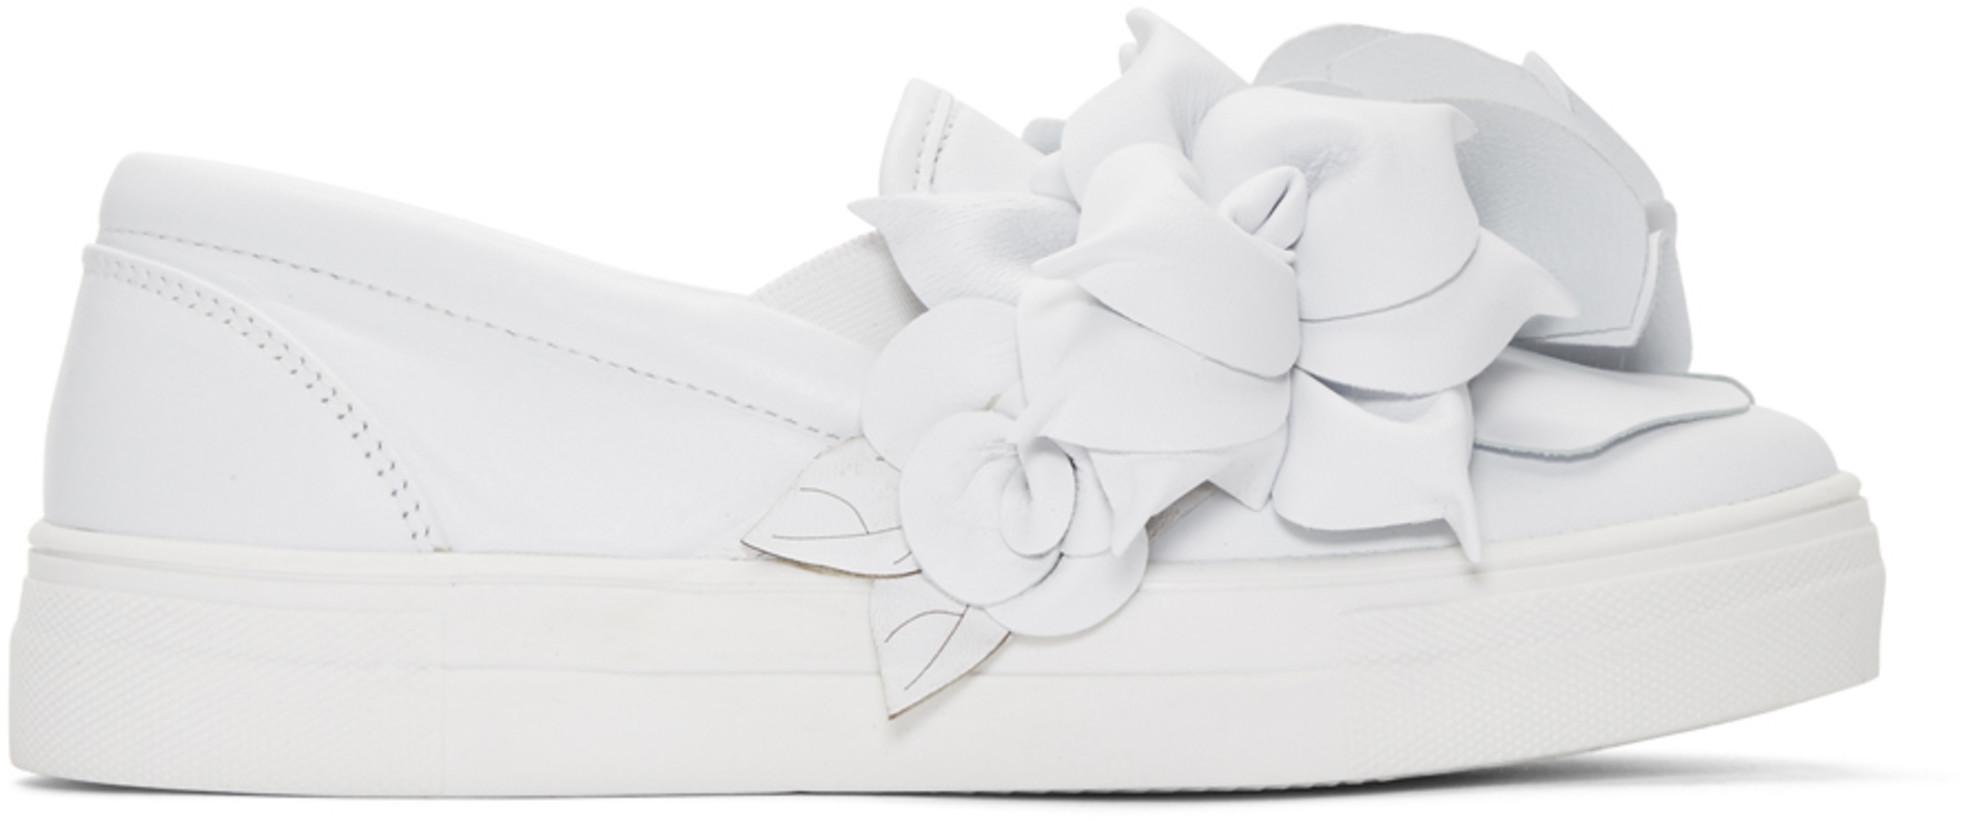 Sophia Webster White Jumbo Lilico Adele Sneakers